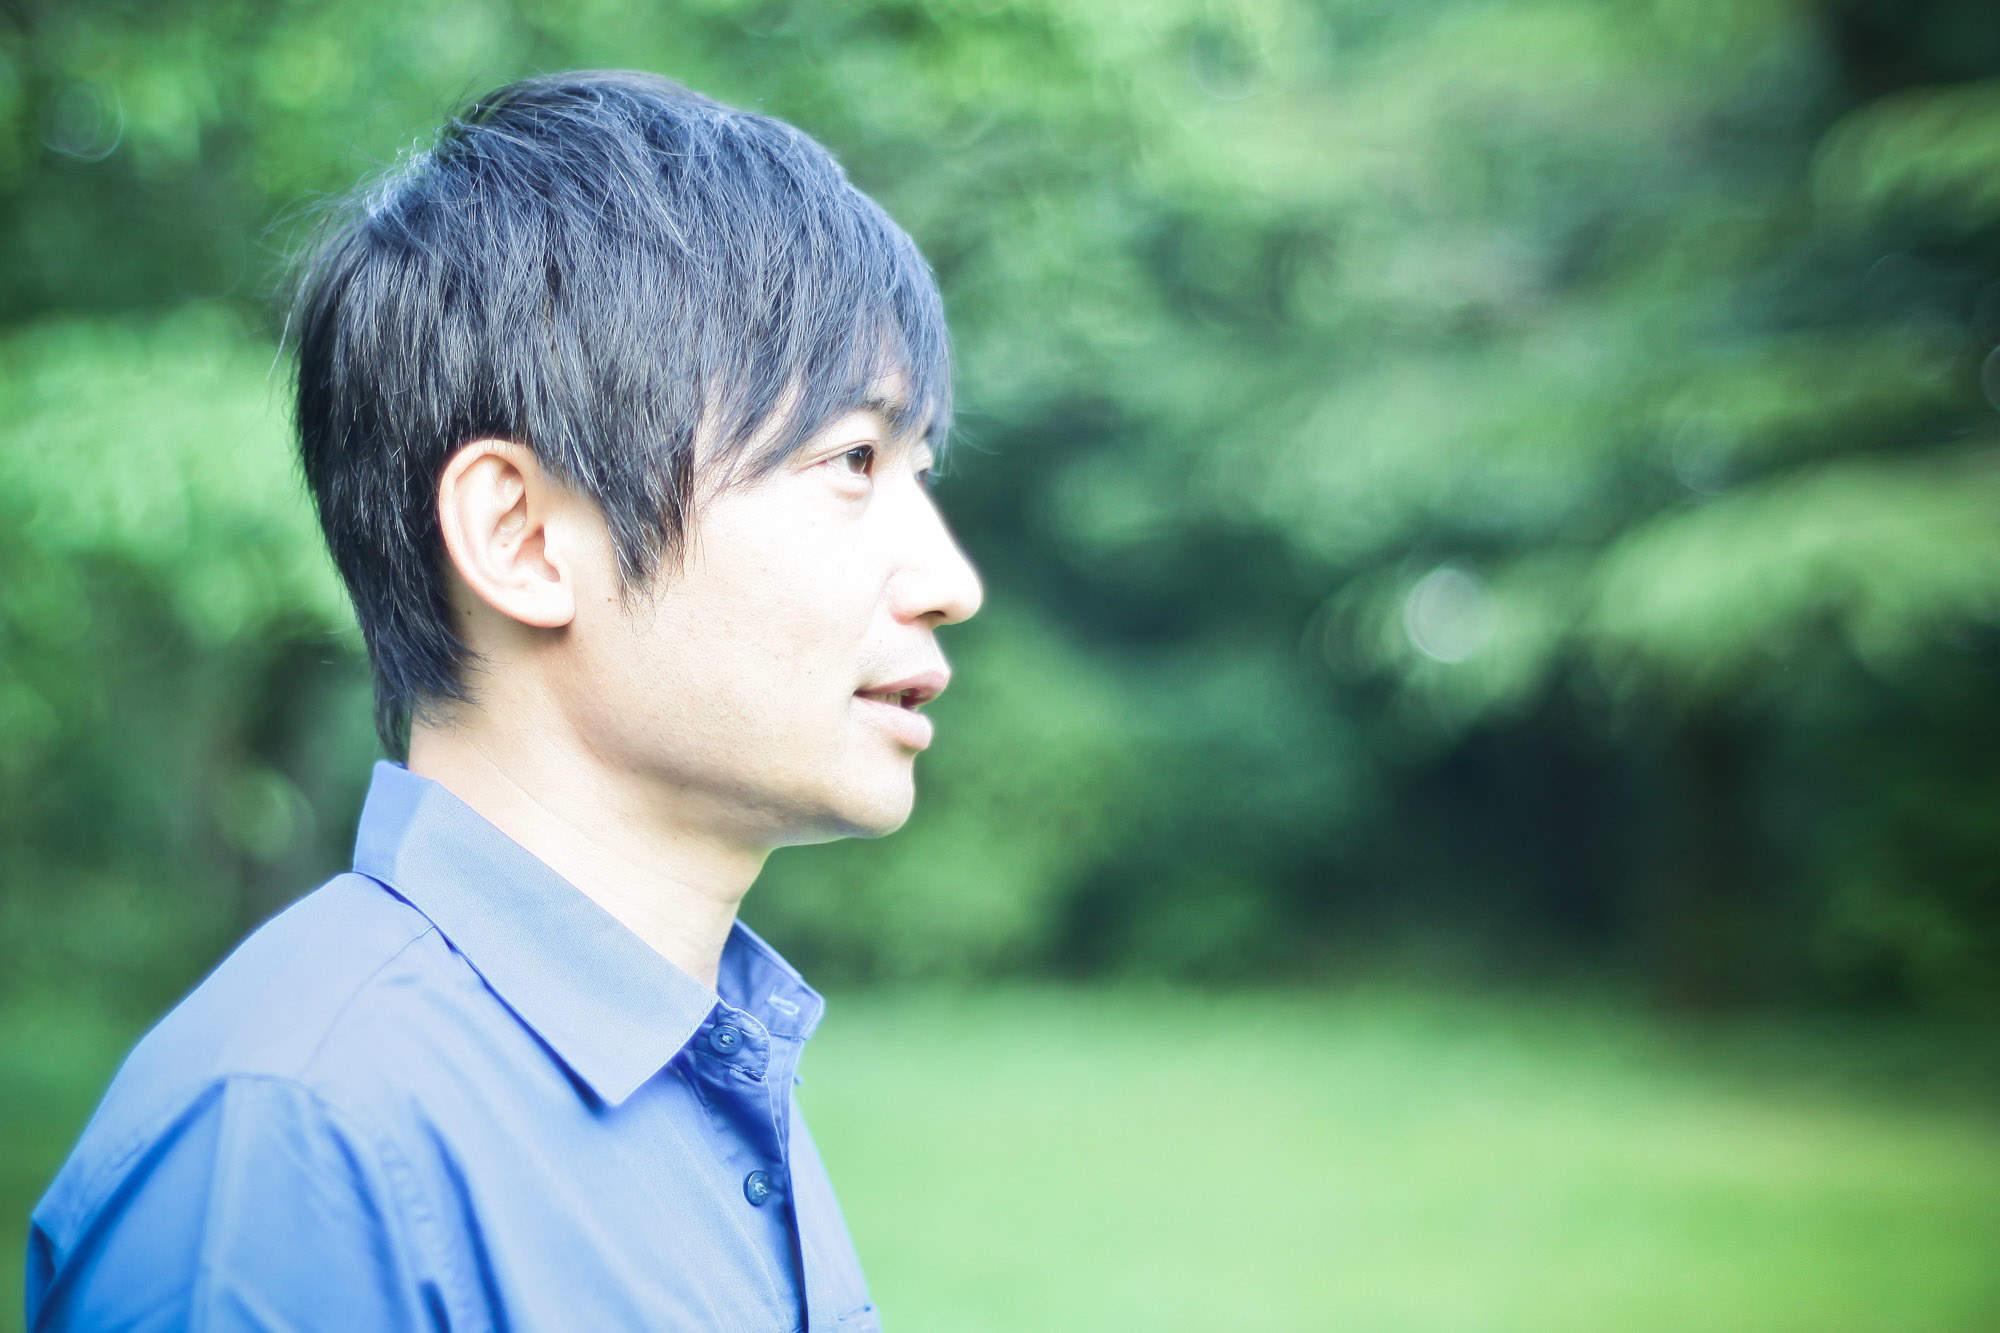 http://rose-records.jp/files/20210811213838.jpg